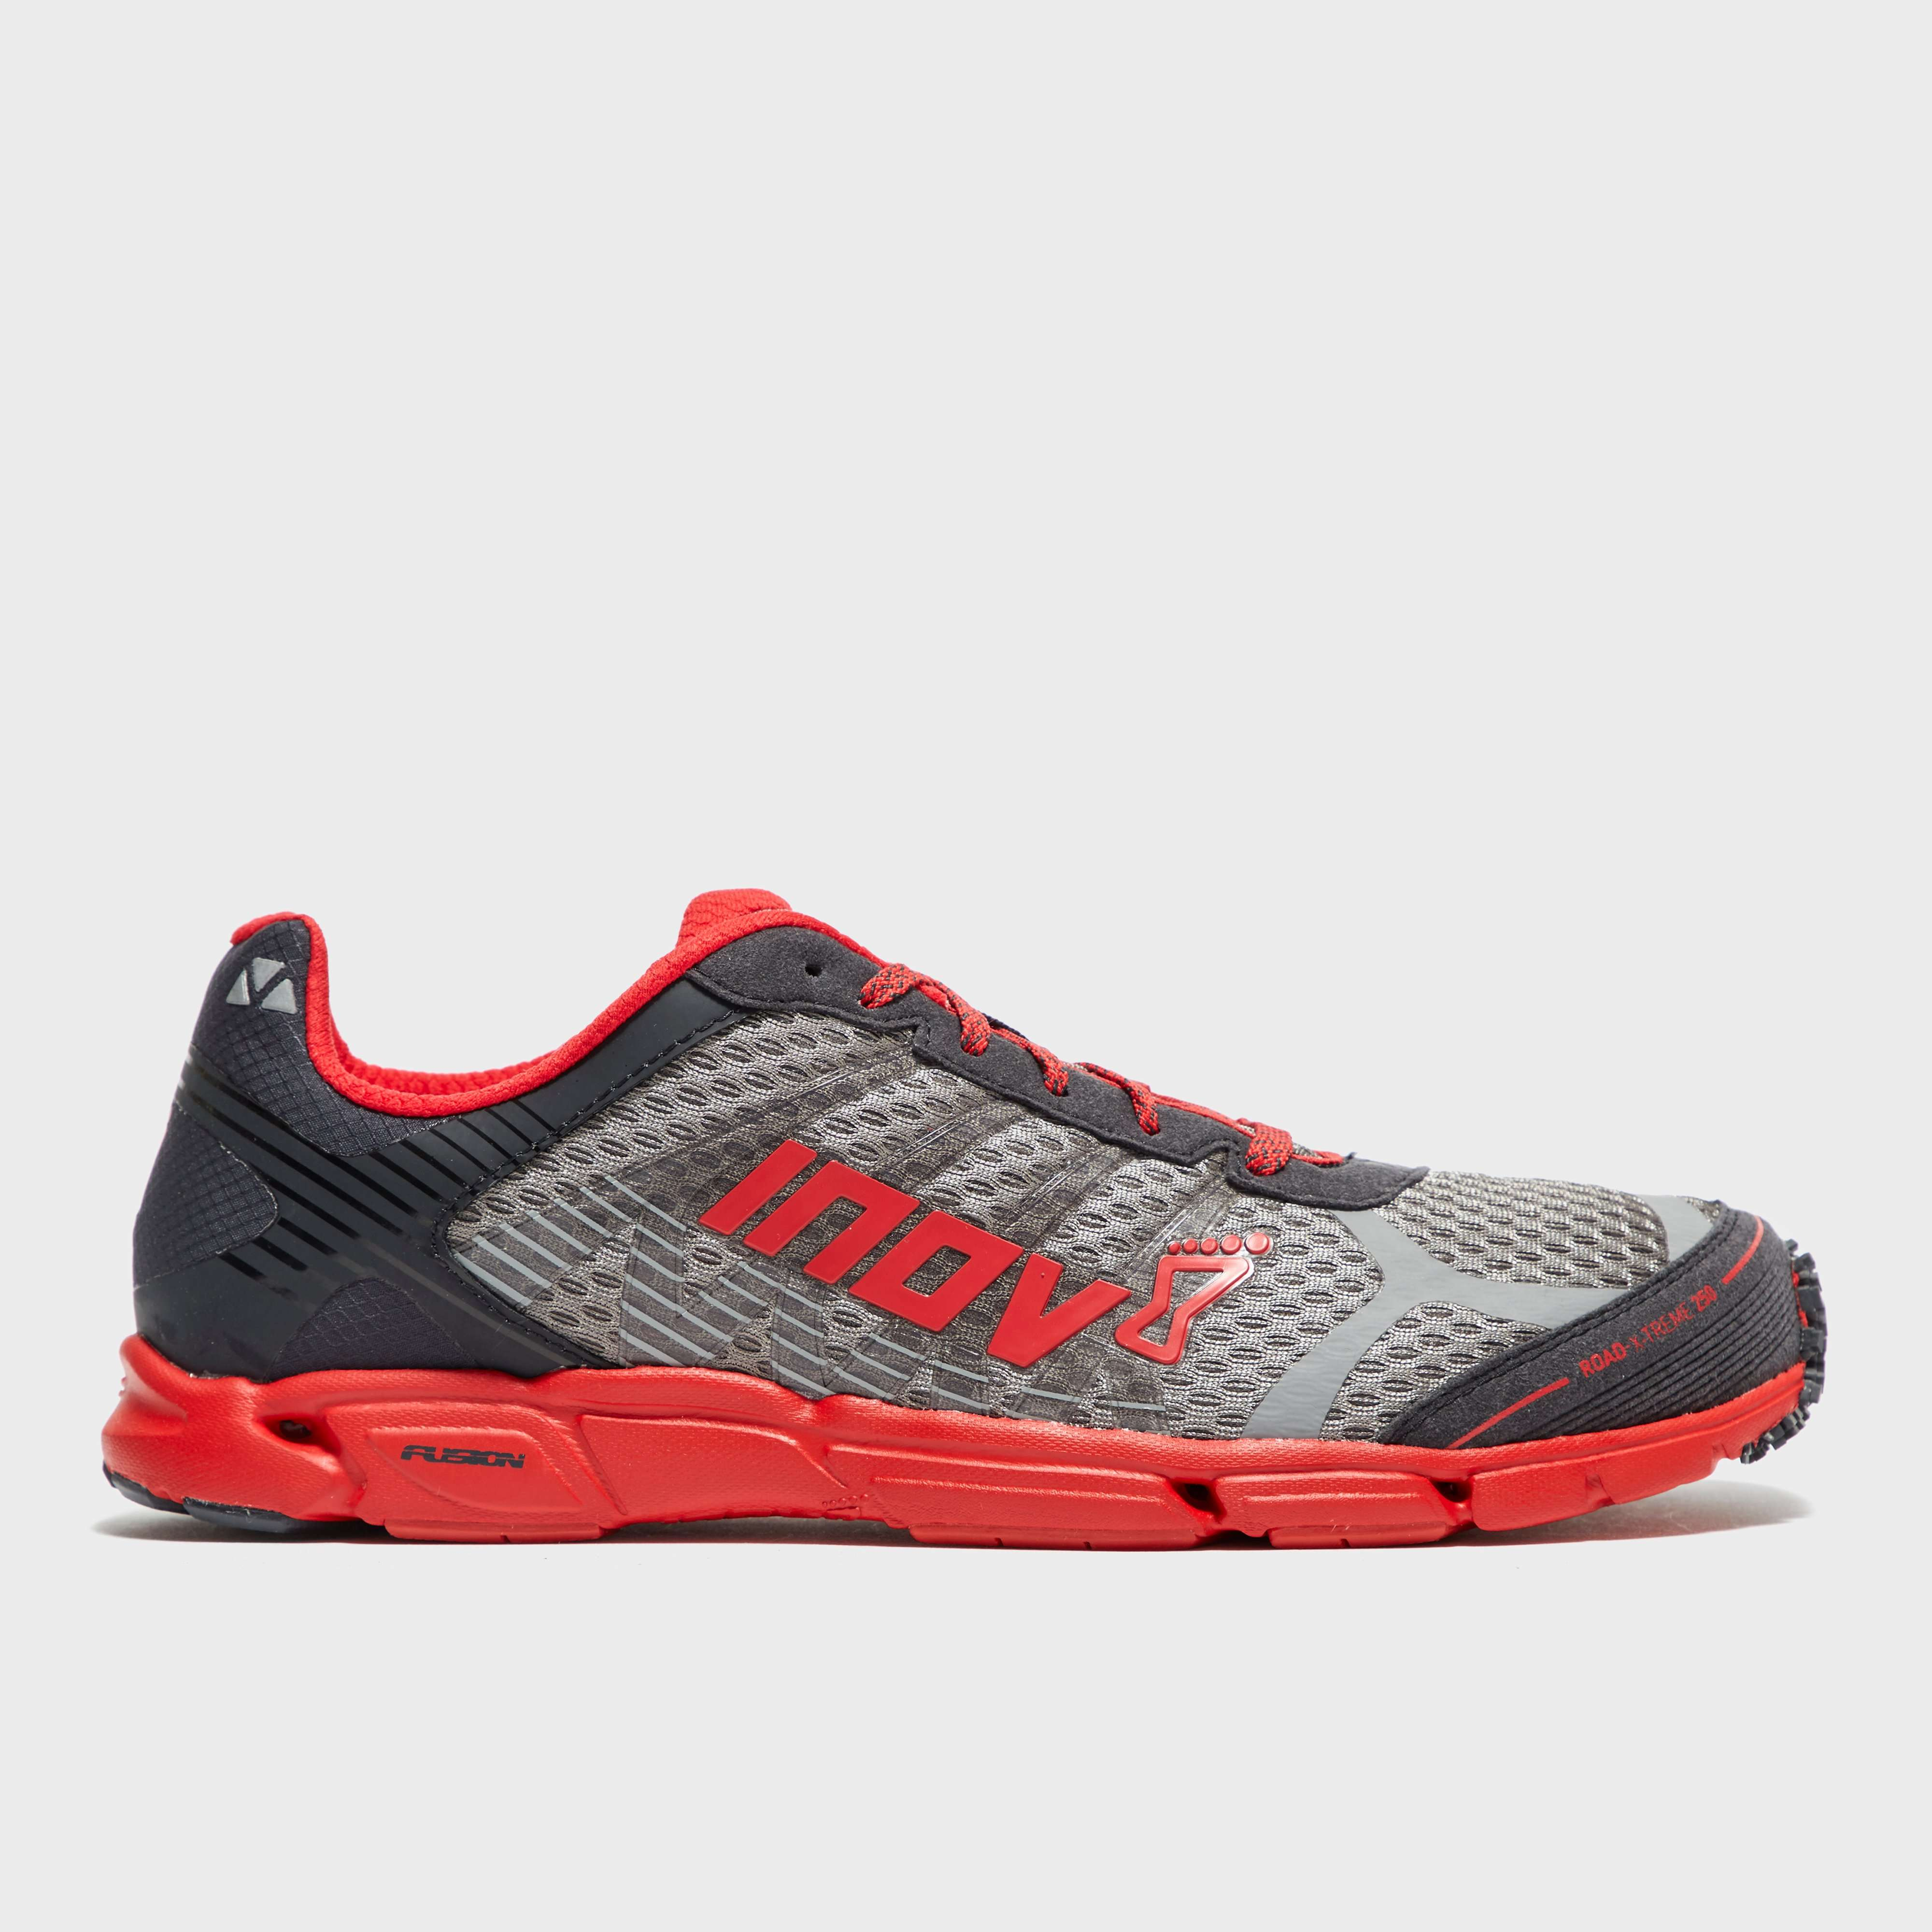 INOV-8 Men's Road X-Treme™ 250 Running Shoe